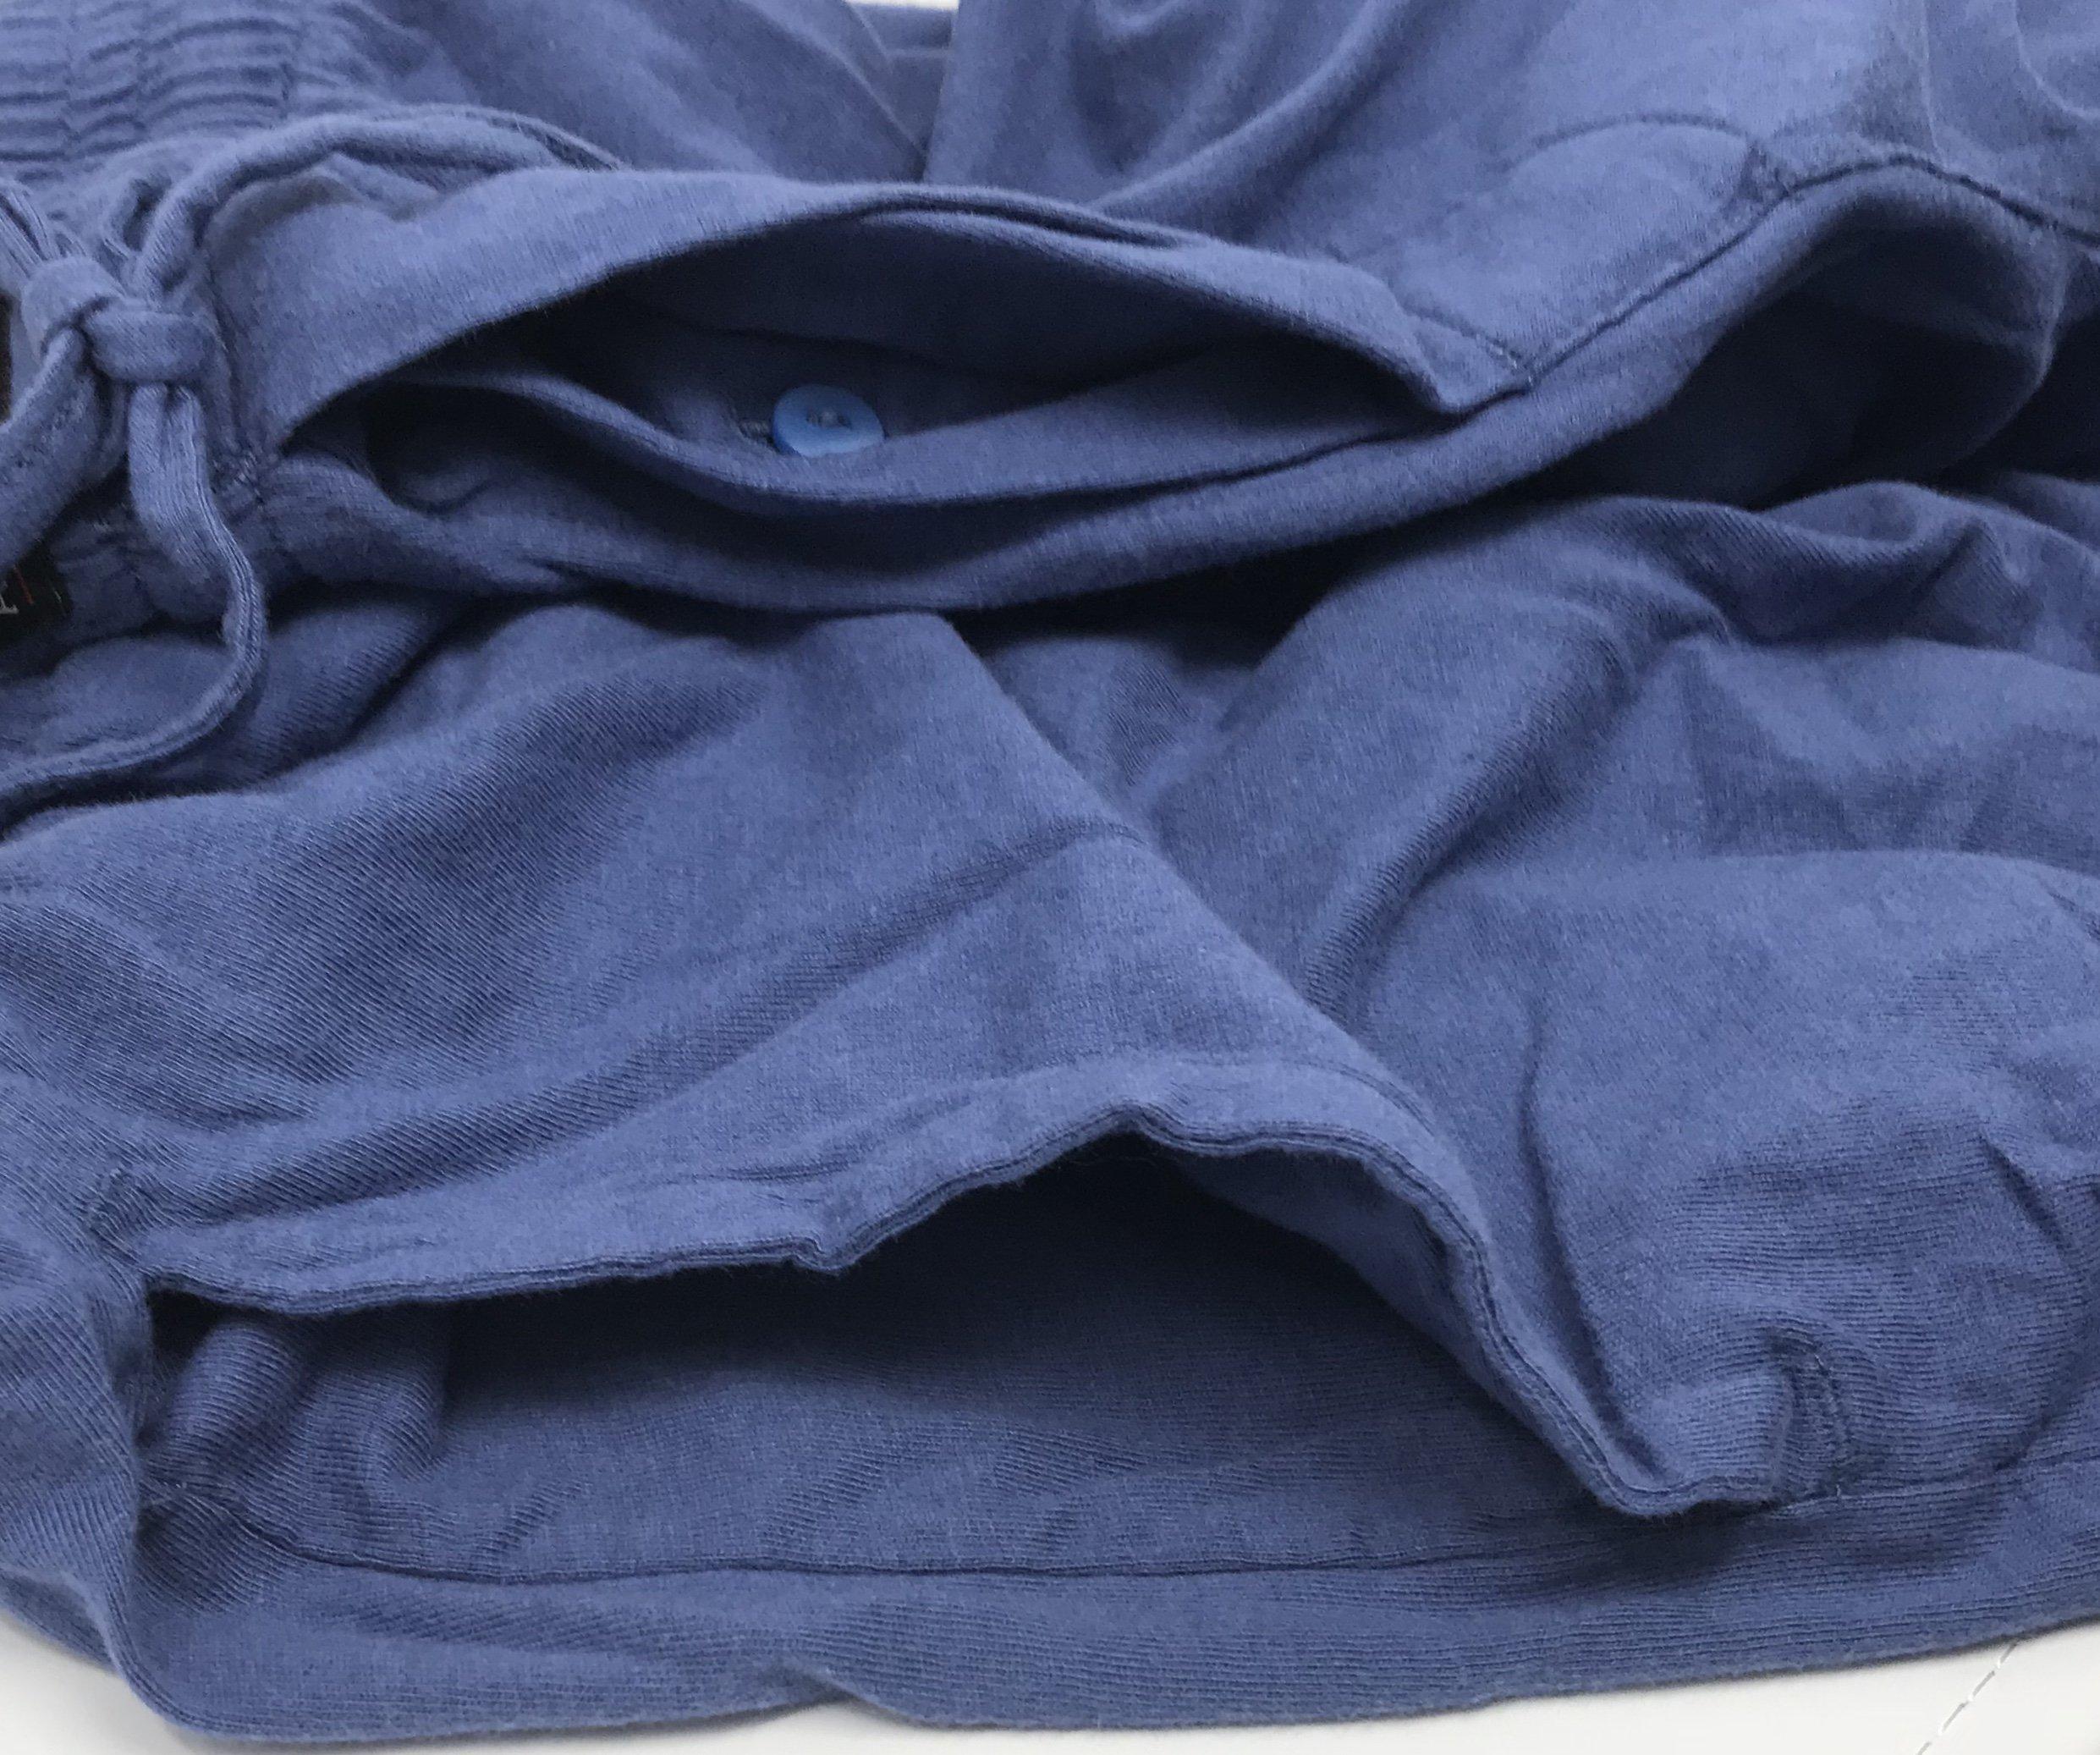 Andrew Scott Men's 6 Pack 100% Cotton Jersey Knit Yoga Lounge & Sleep Pajama Pants (6 Pack - Navy/Black/Royal/Hunter/White/Grey, Medium) by Andrew Scott (Image #4)